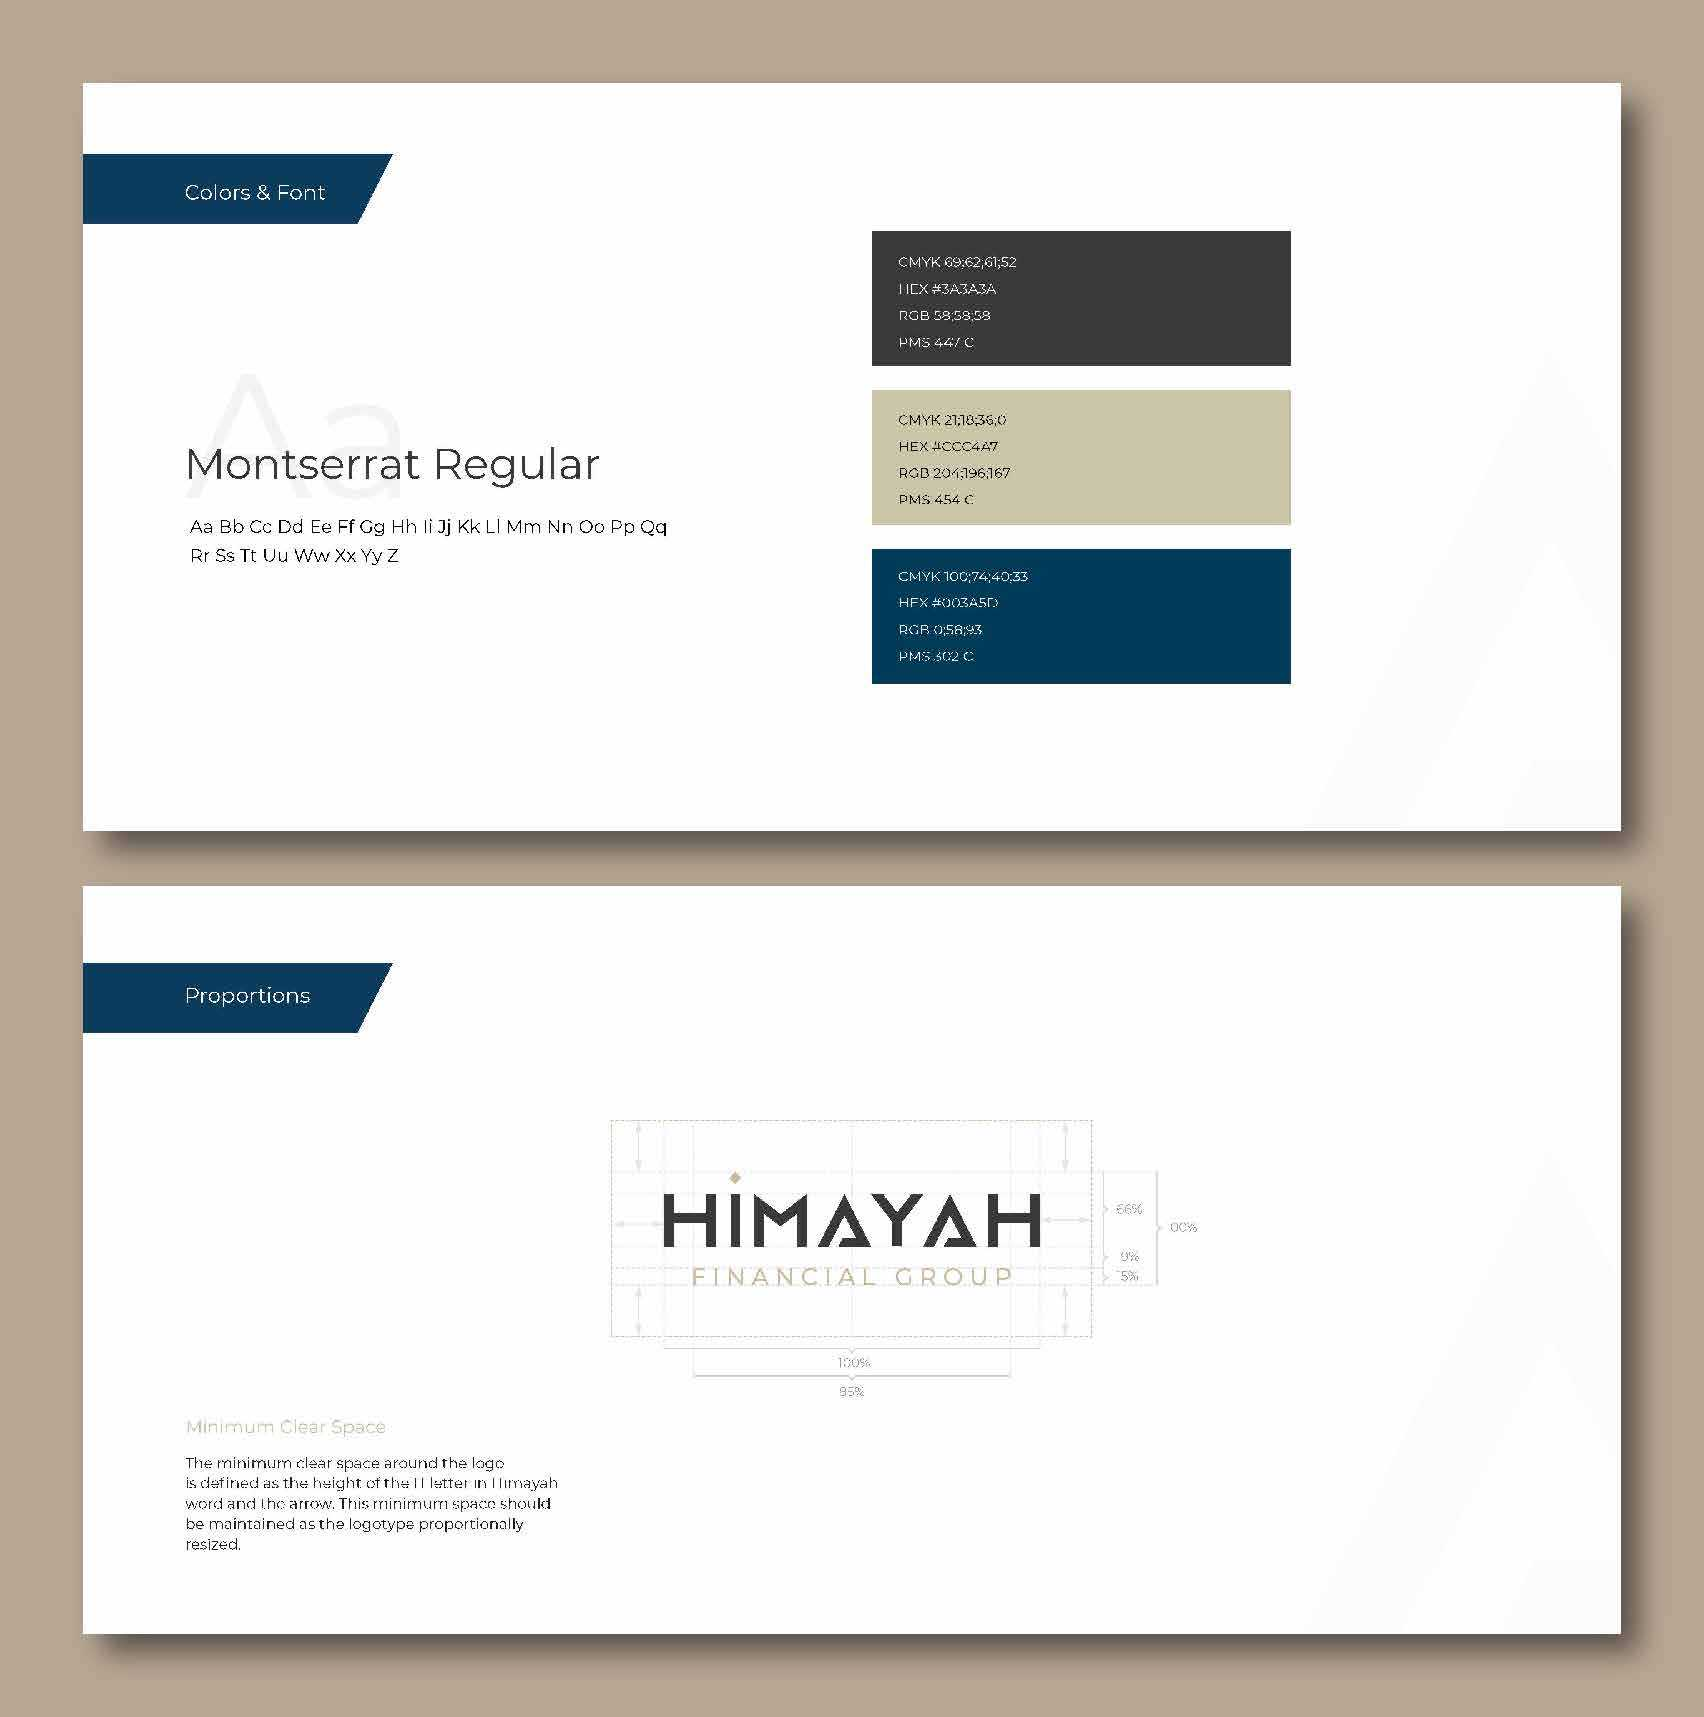 Logo guide for the Himayah logo.